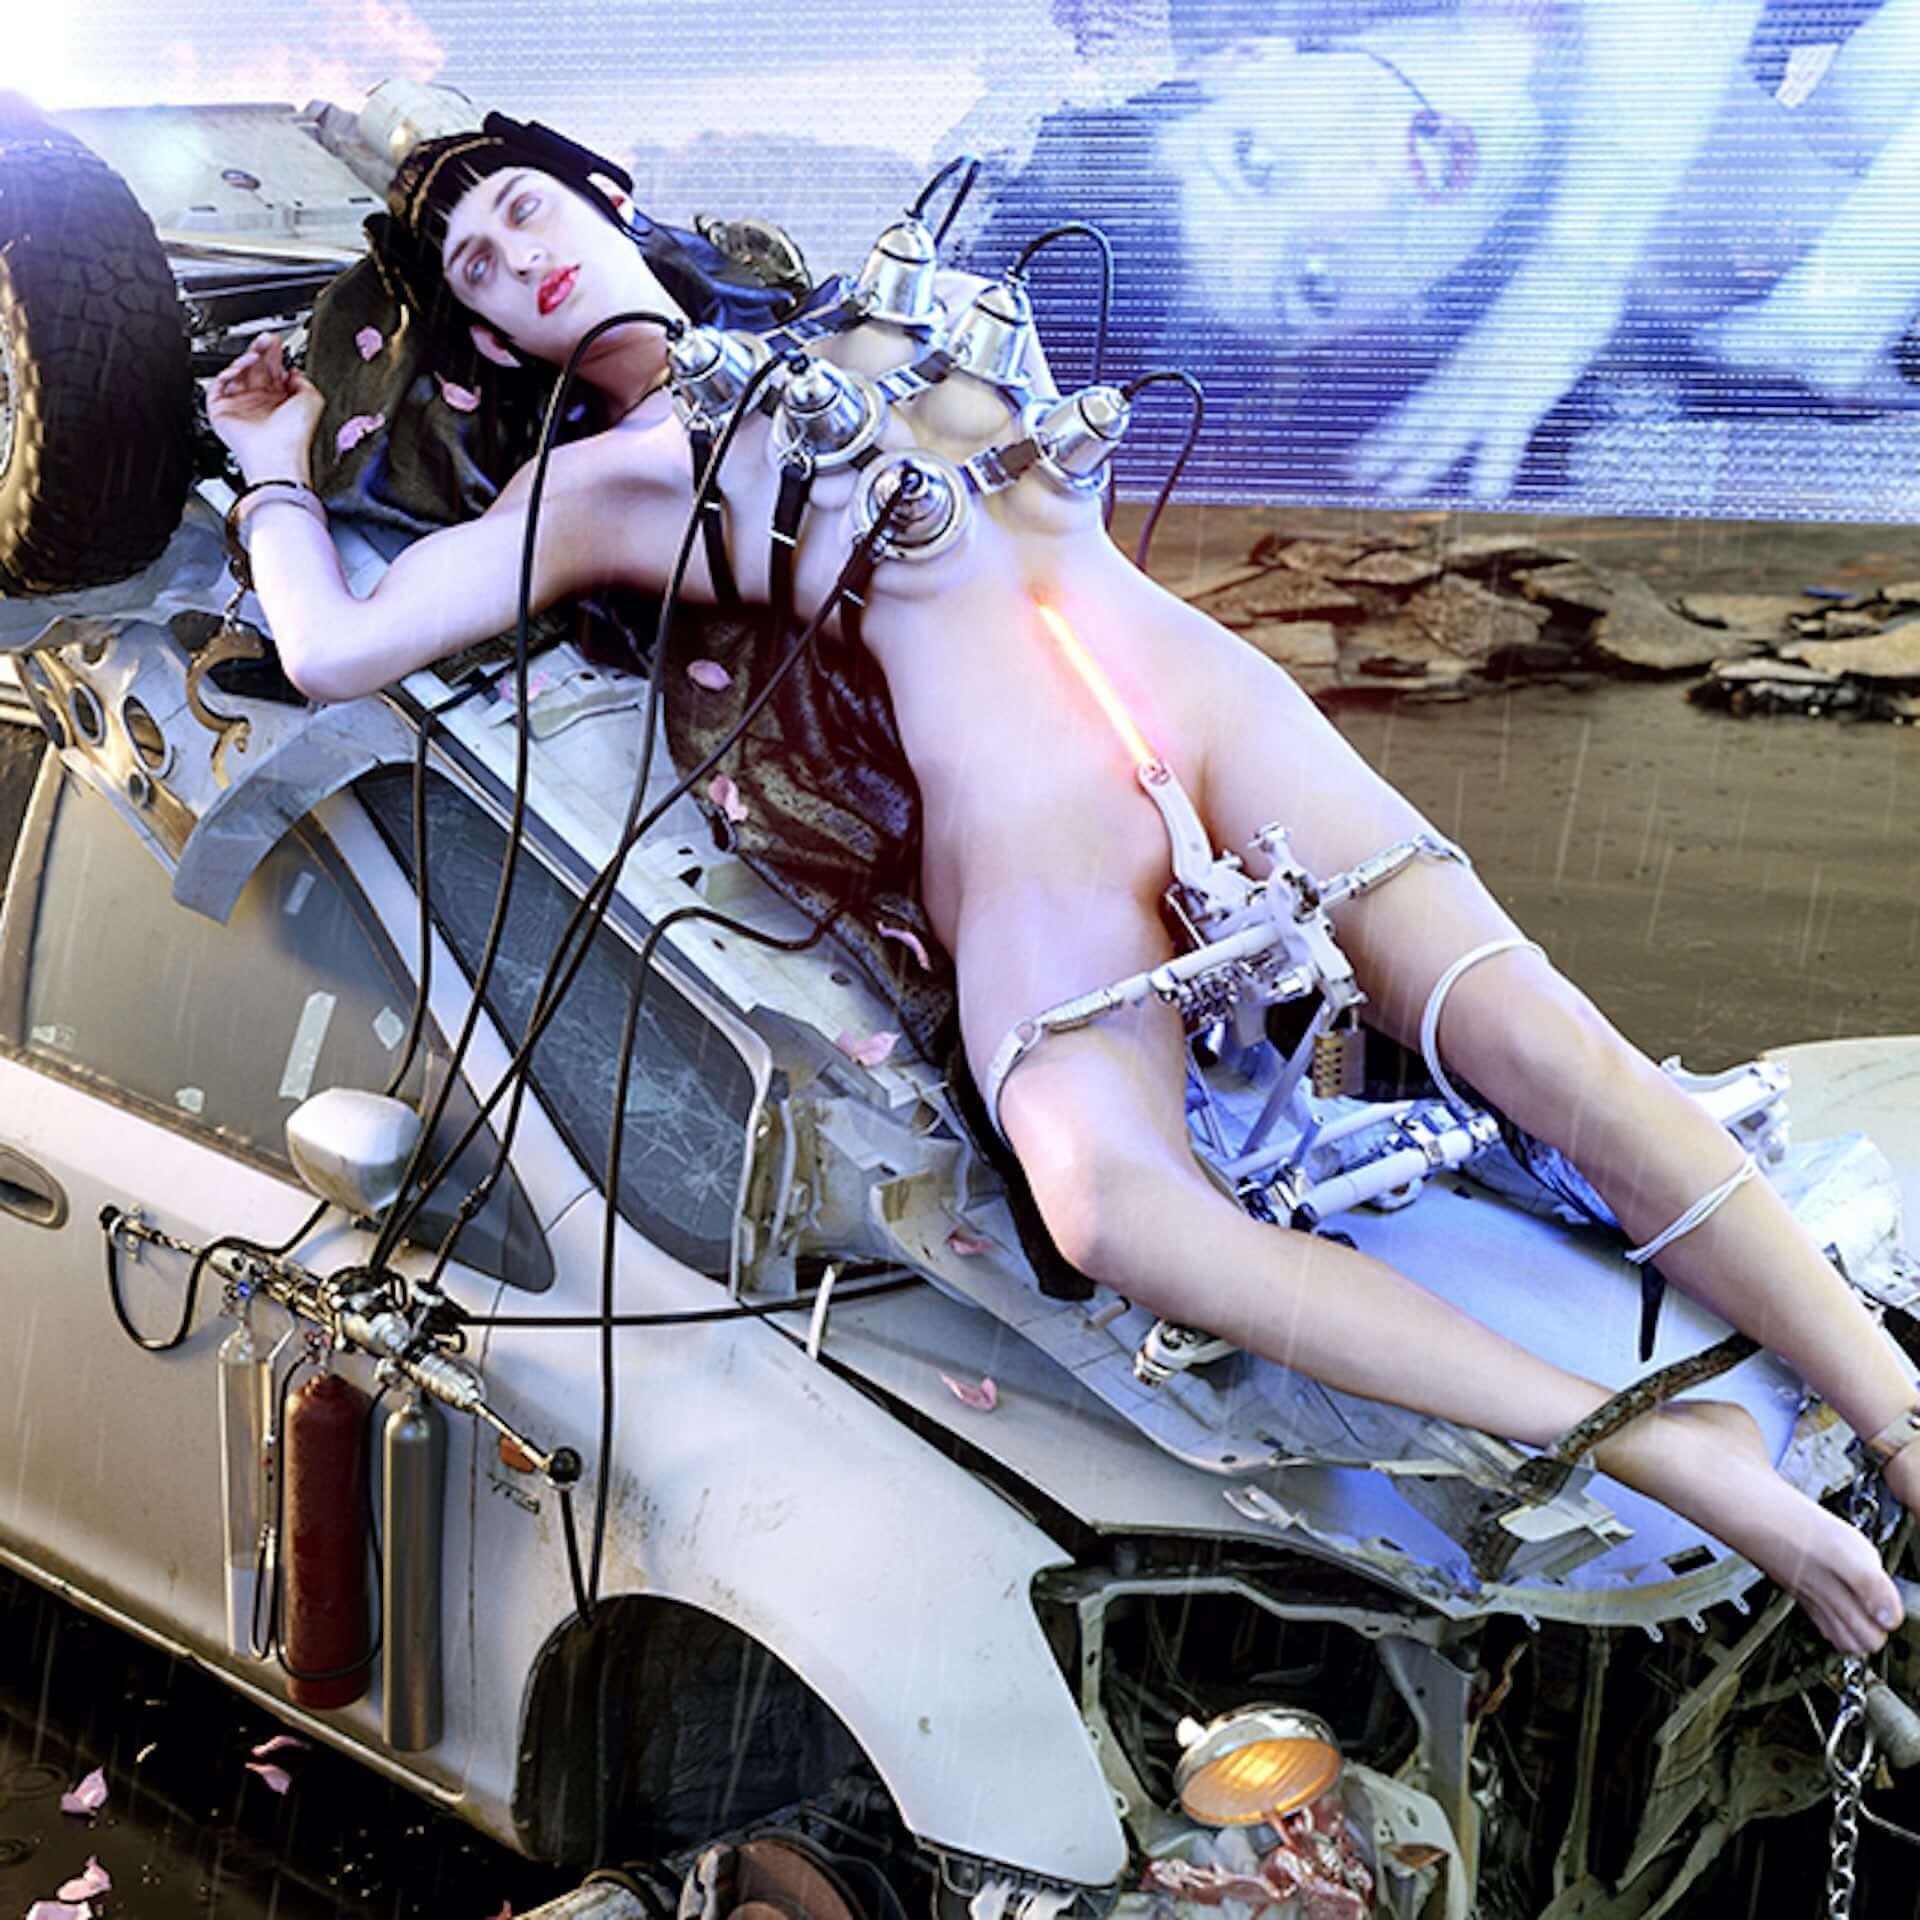 "Björk、Rosalia、SOPHIEらを迎えたARCAの最新アルバム『KiCk i』から""Mequetrefe""が配信開始|6時間超えの新プレイリストも公開 music200619_arca_5-1920x1920"